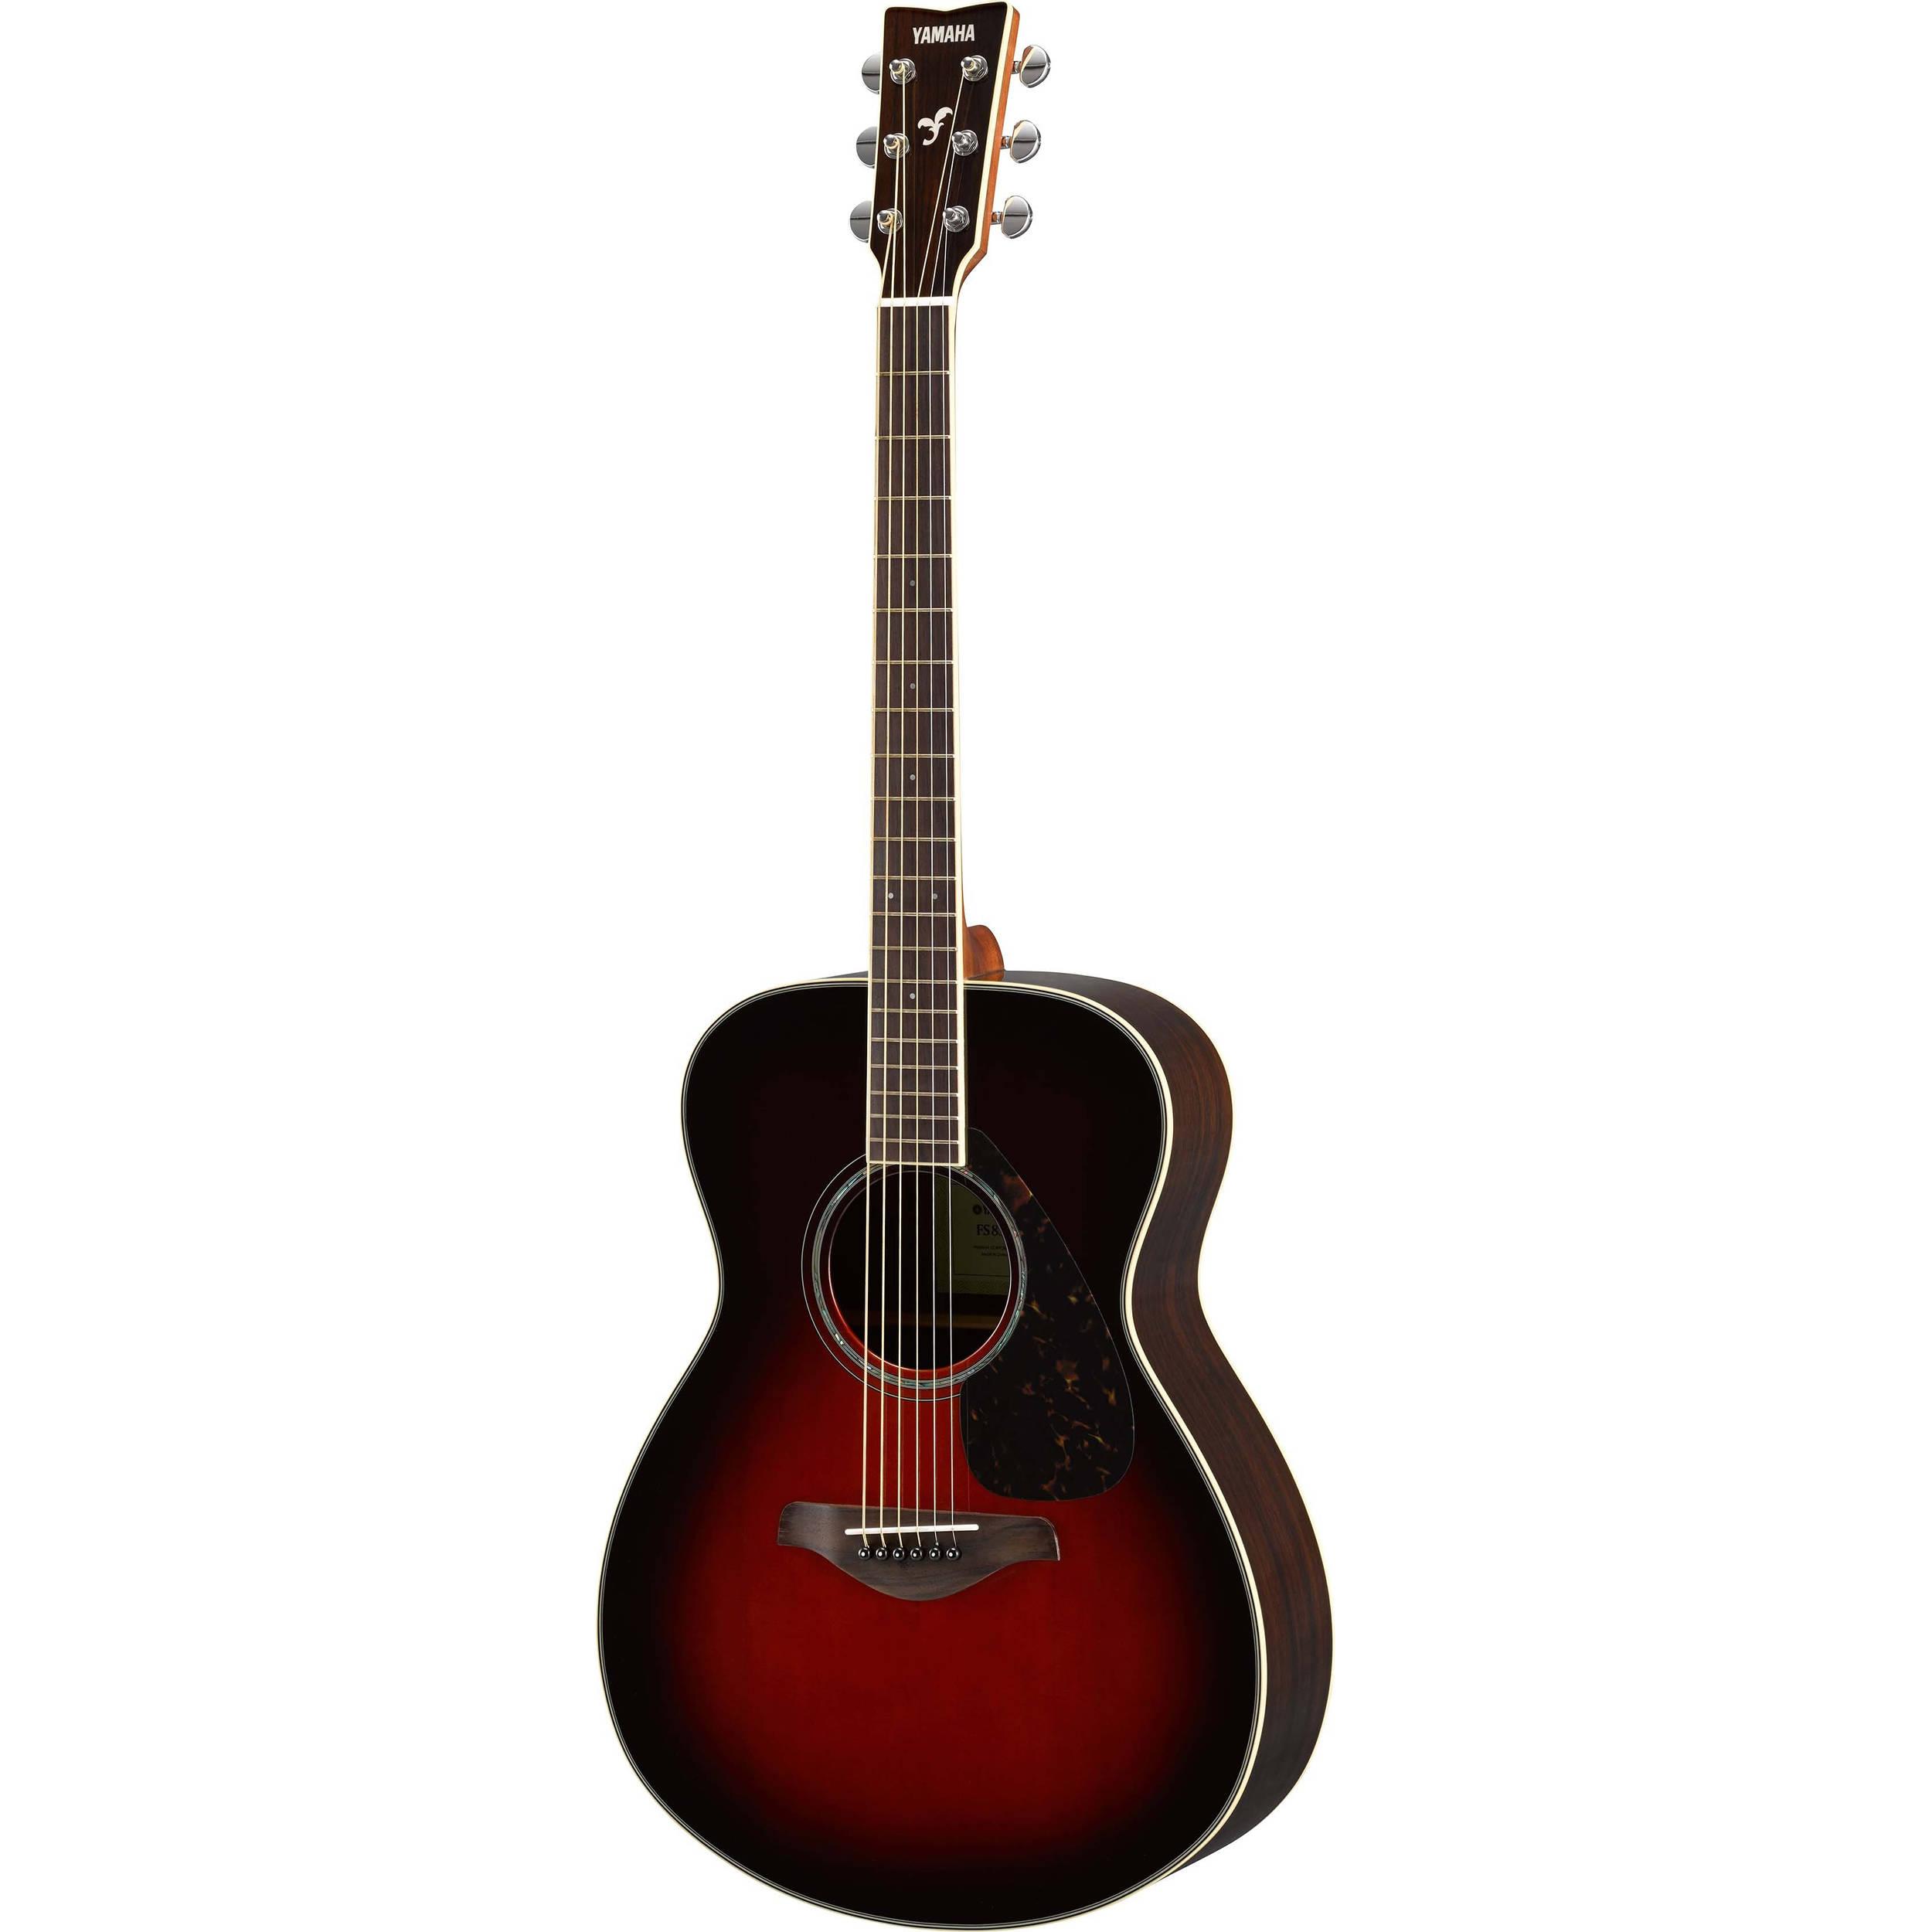 Yamaha fs830 fs series concert style acoustic guitar fs830 tbs for Yamaha series a